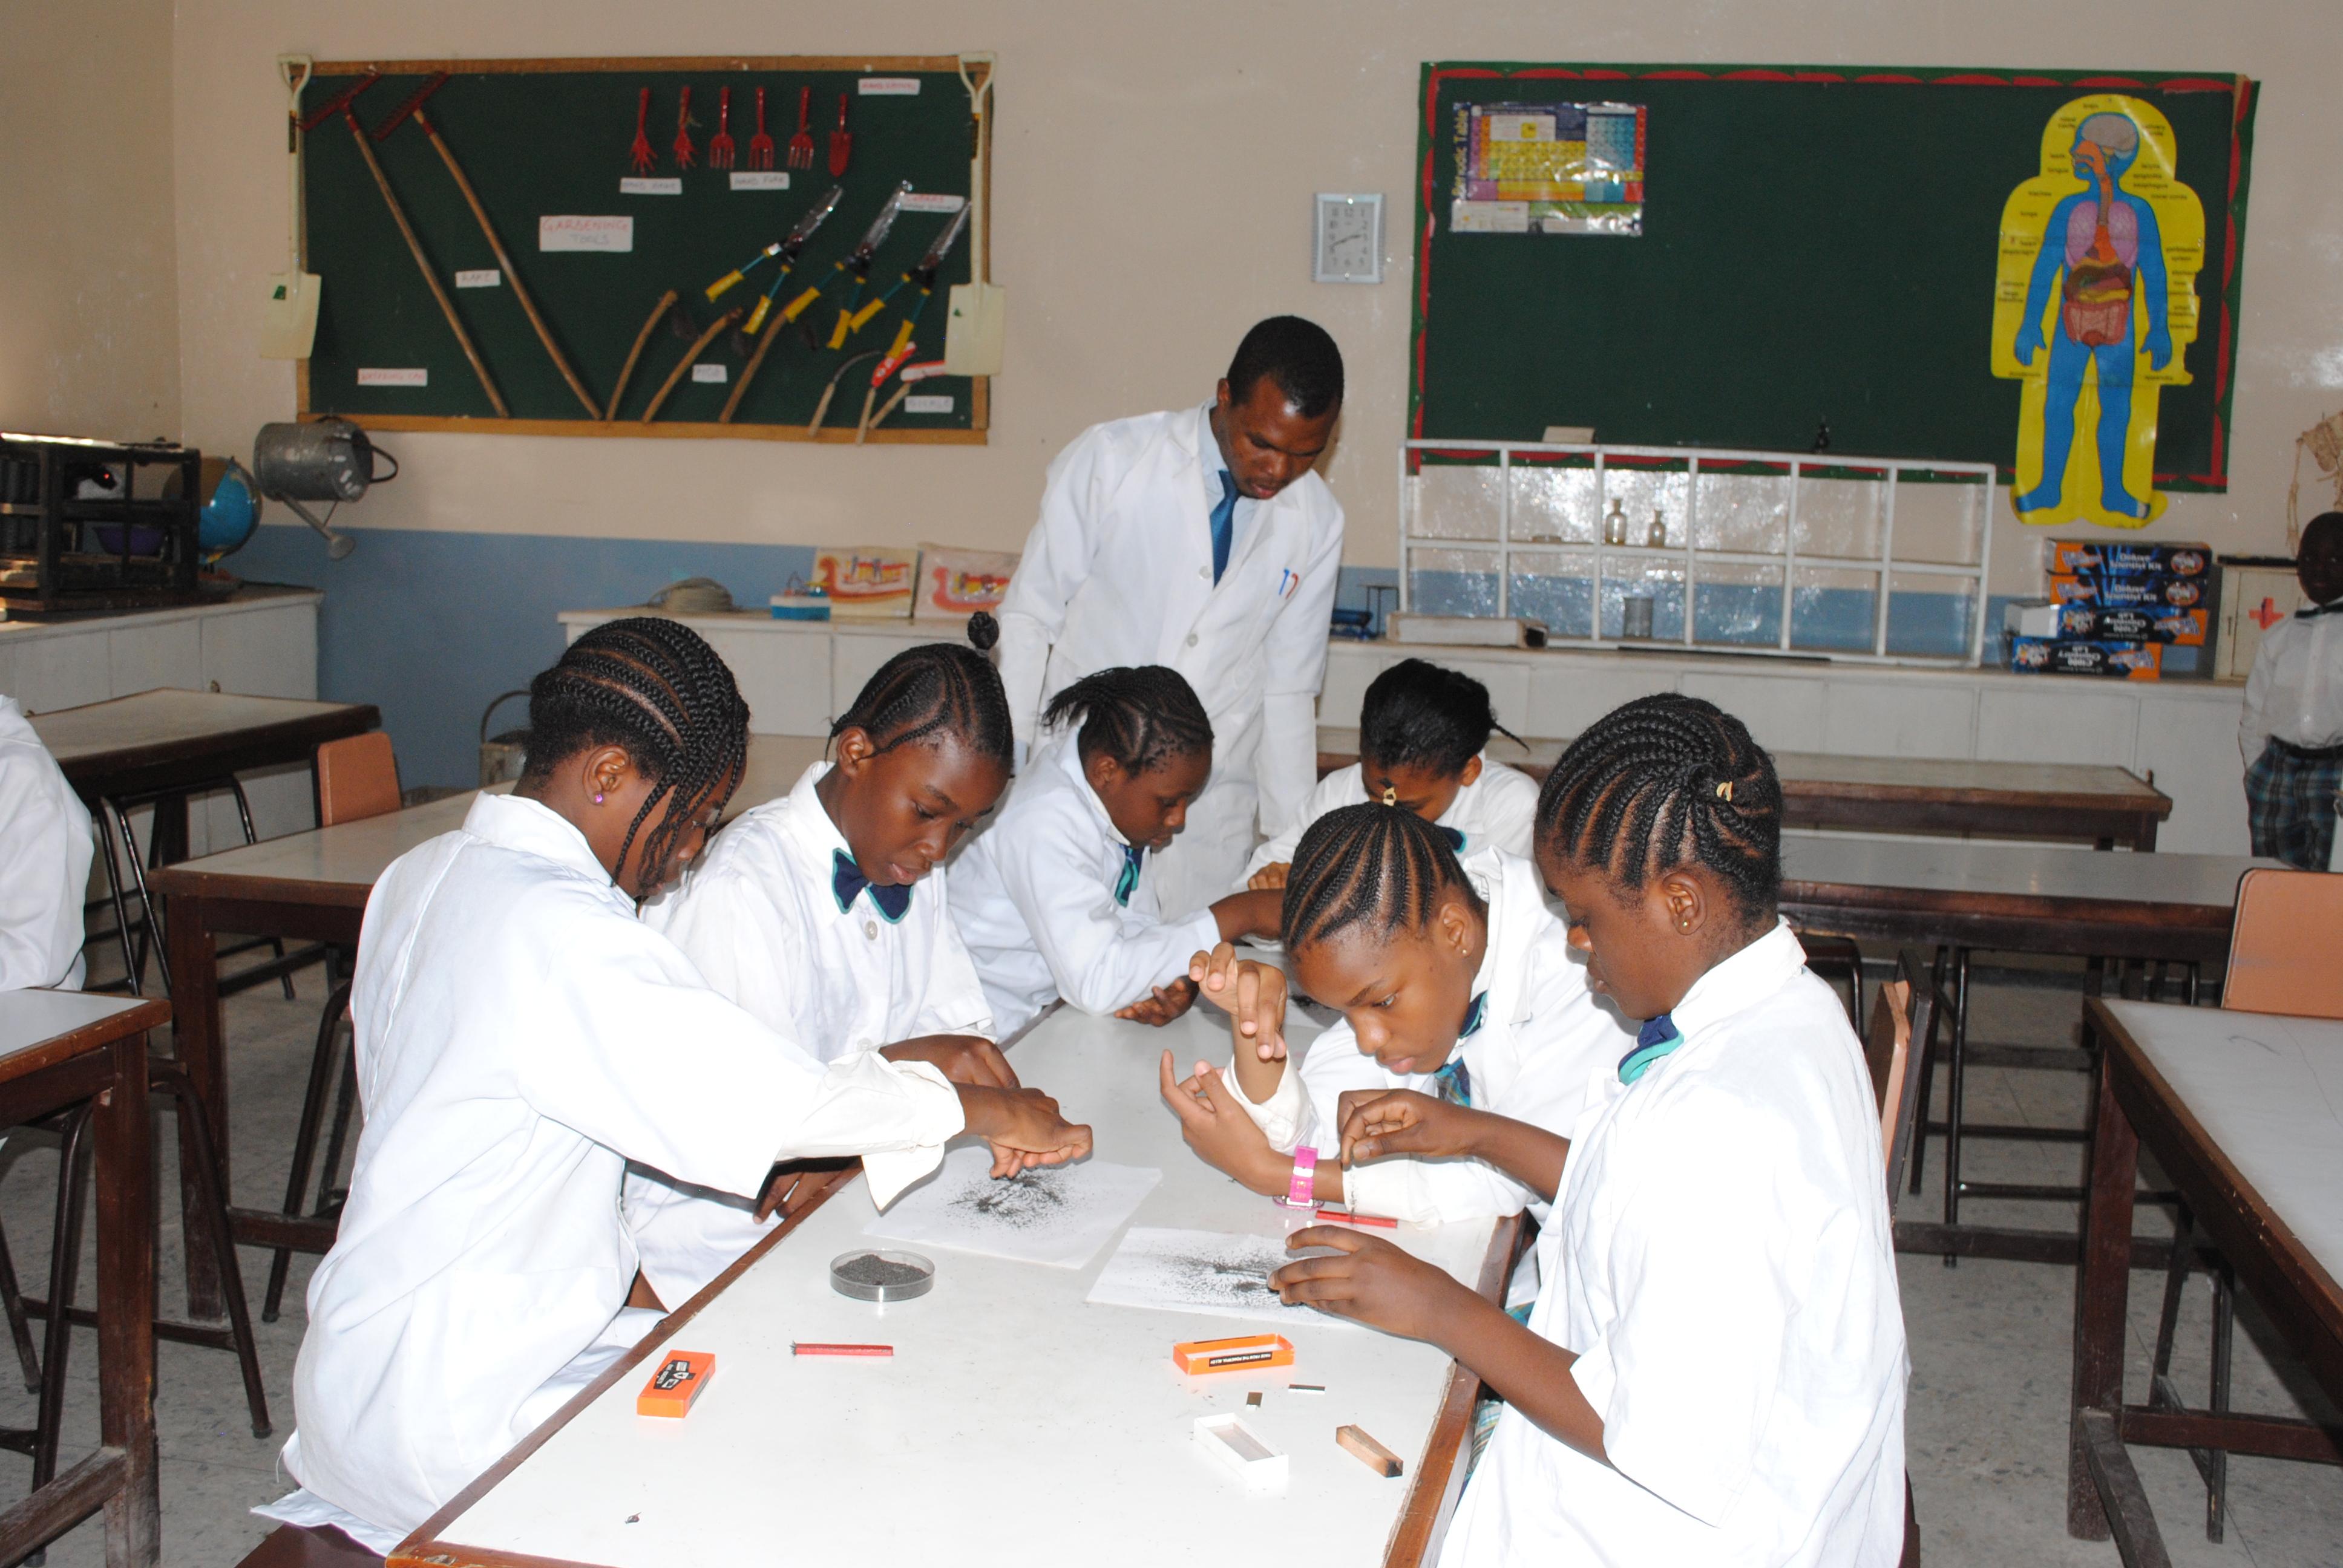 Danbo International Schools